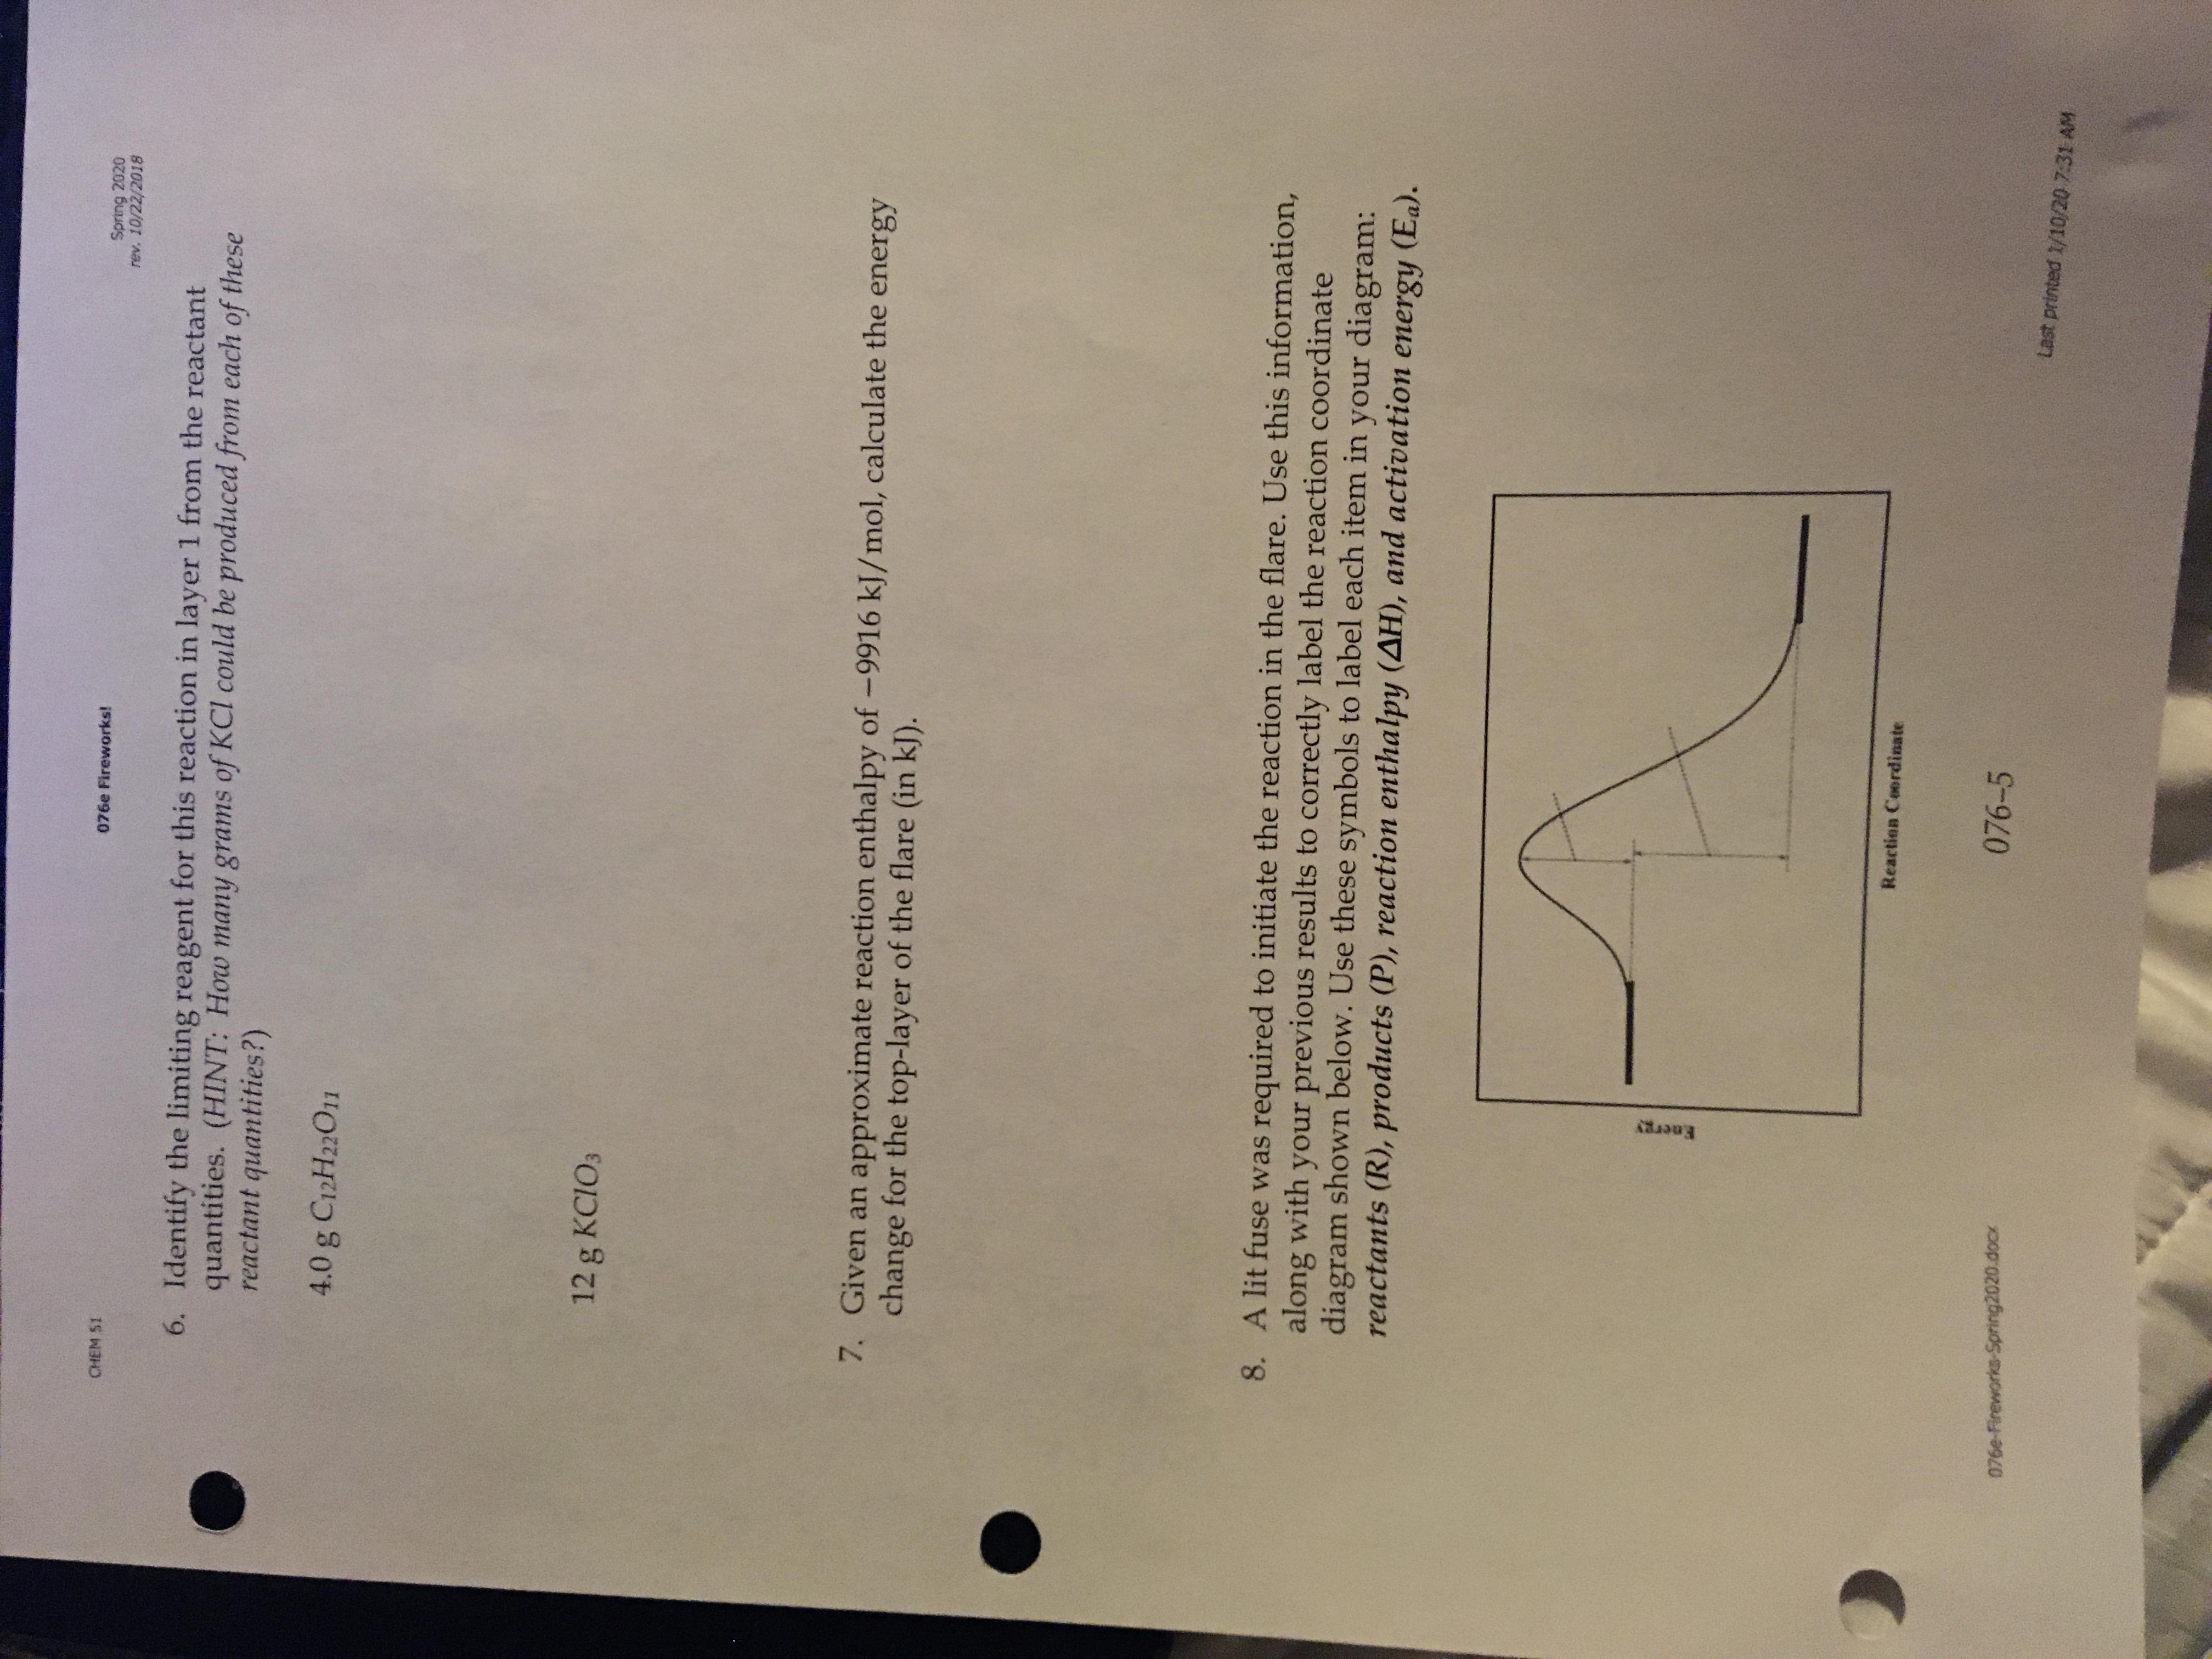 Answered Spring Rev 10 22 Chem S1